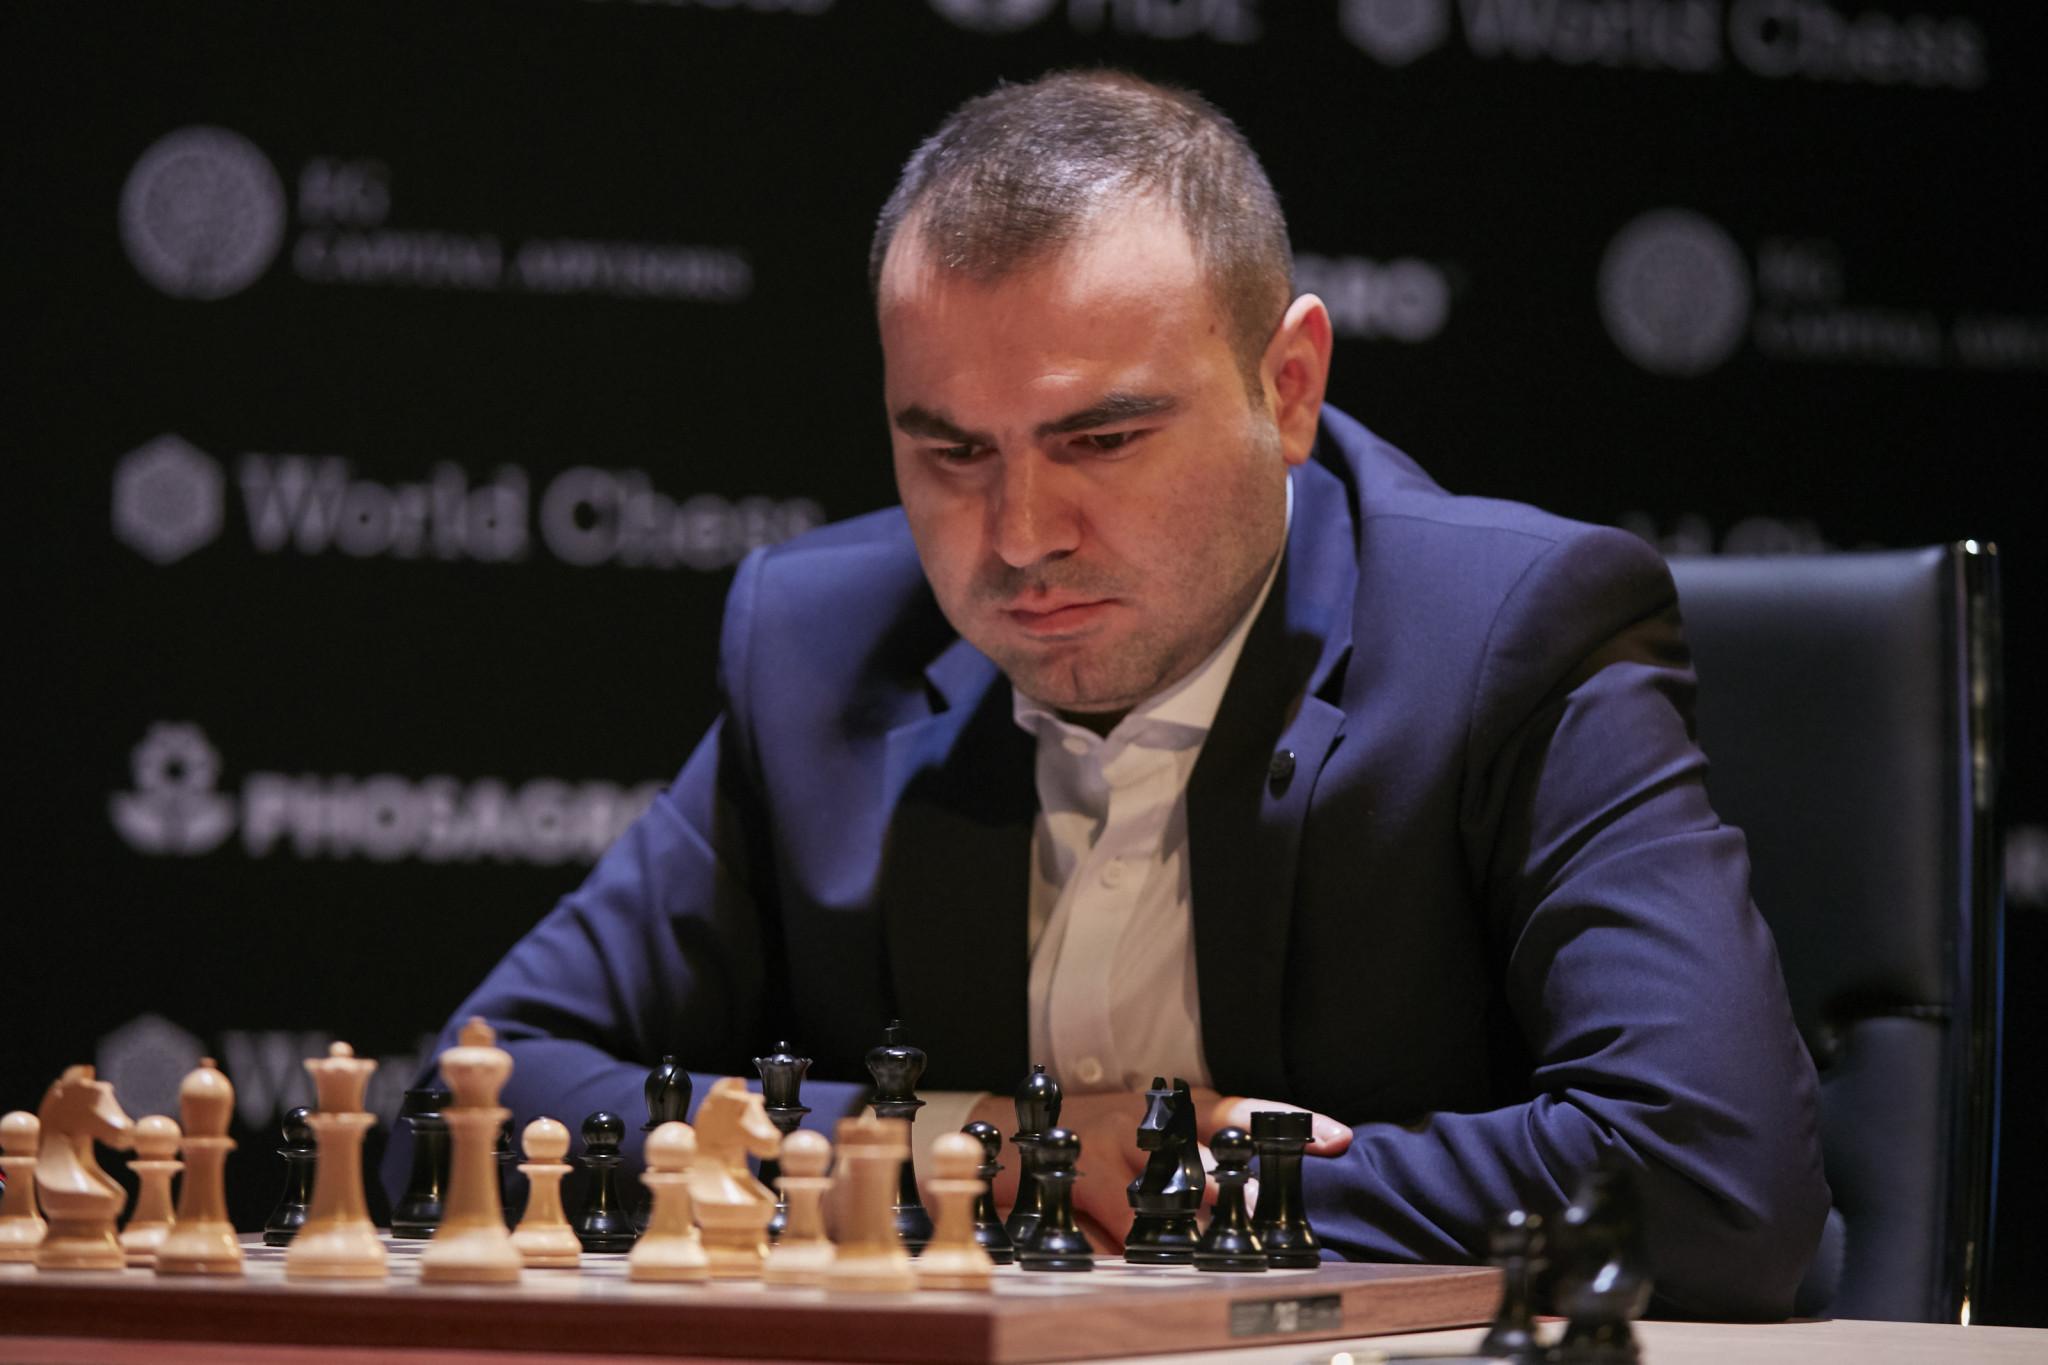 Shakhriyar Mamedyarov drew for the second straight match ©Getty Images